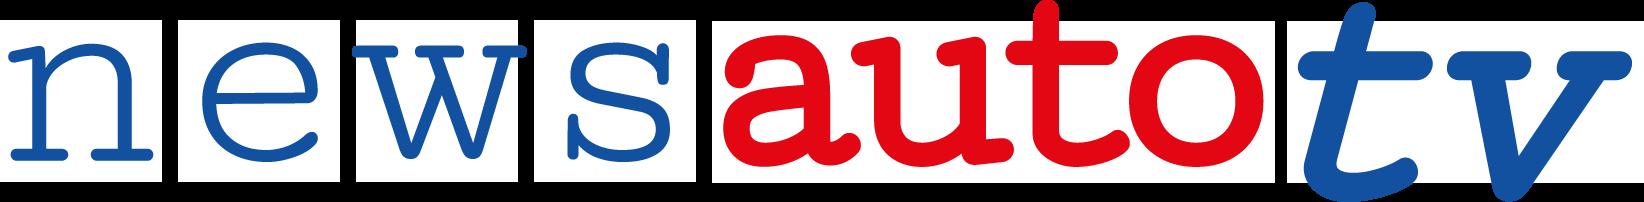 newsautoTV logo